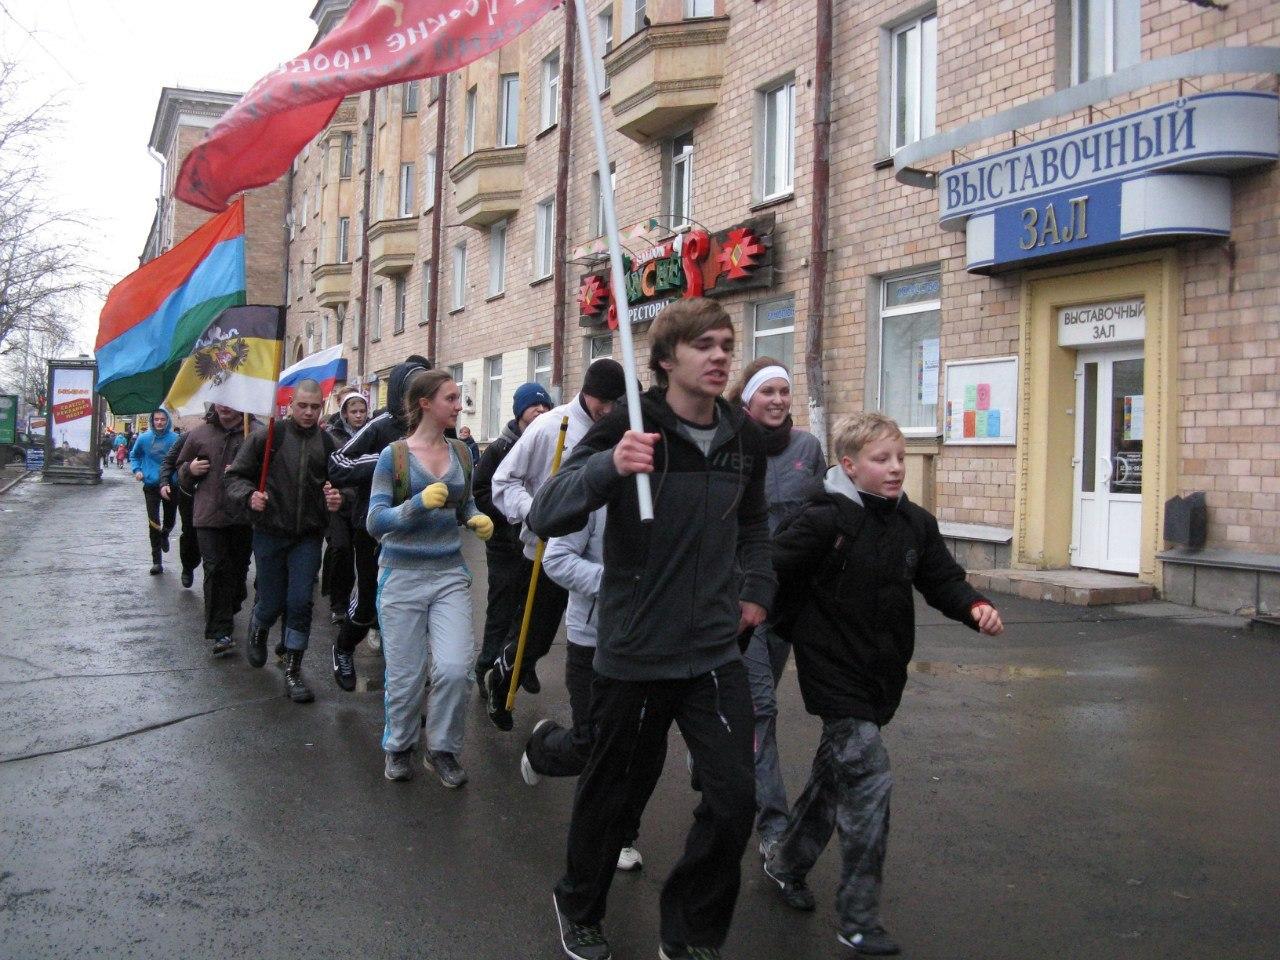 «Слава предкам, слава роду, слава русскому народу!»